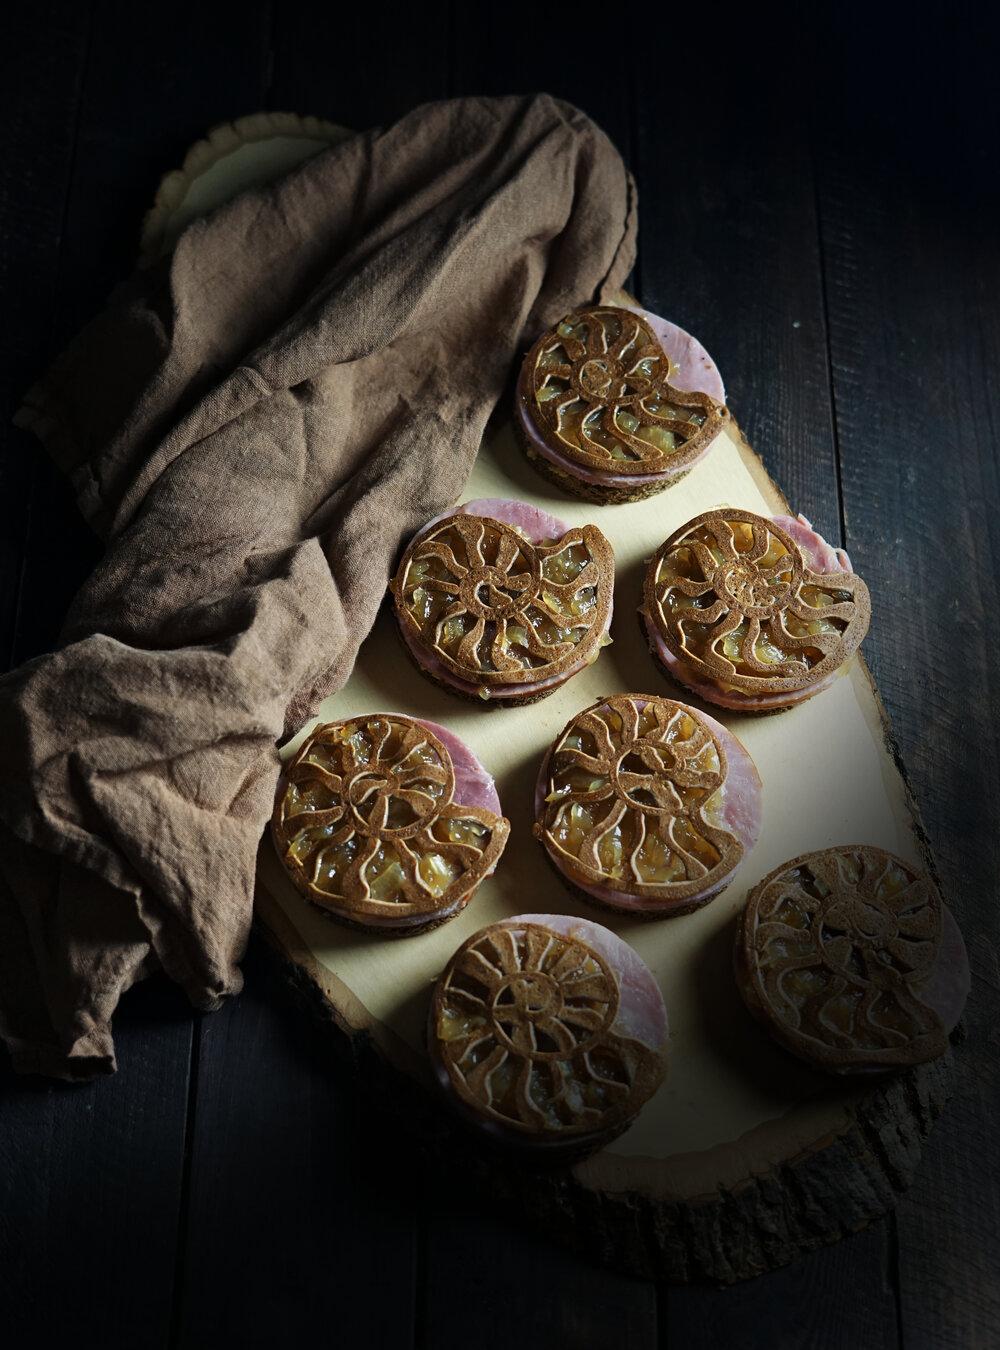 (H)Ammonite Sandwiches with Yarrow Onion Jam